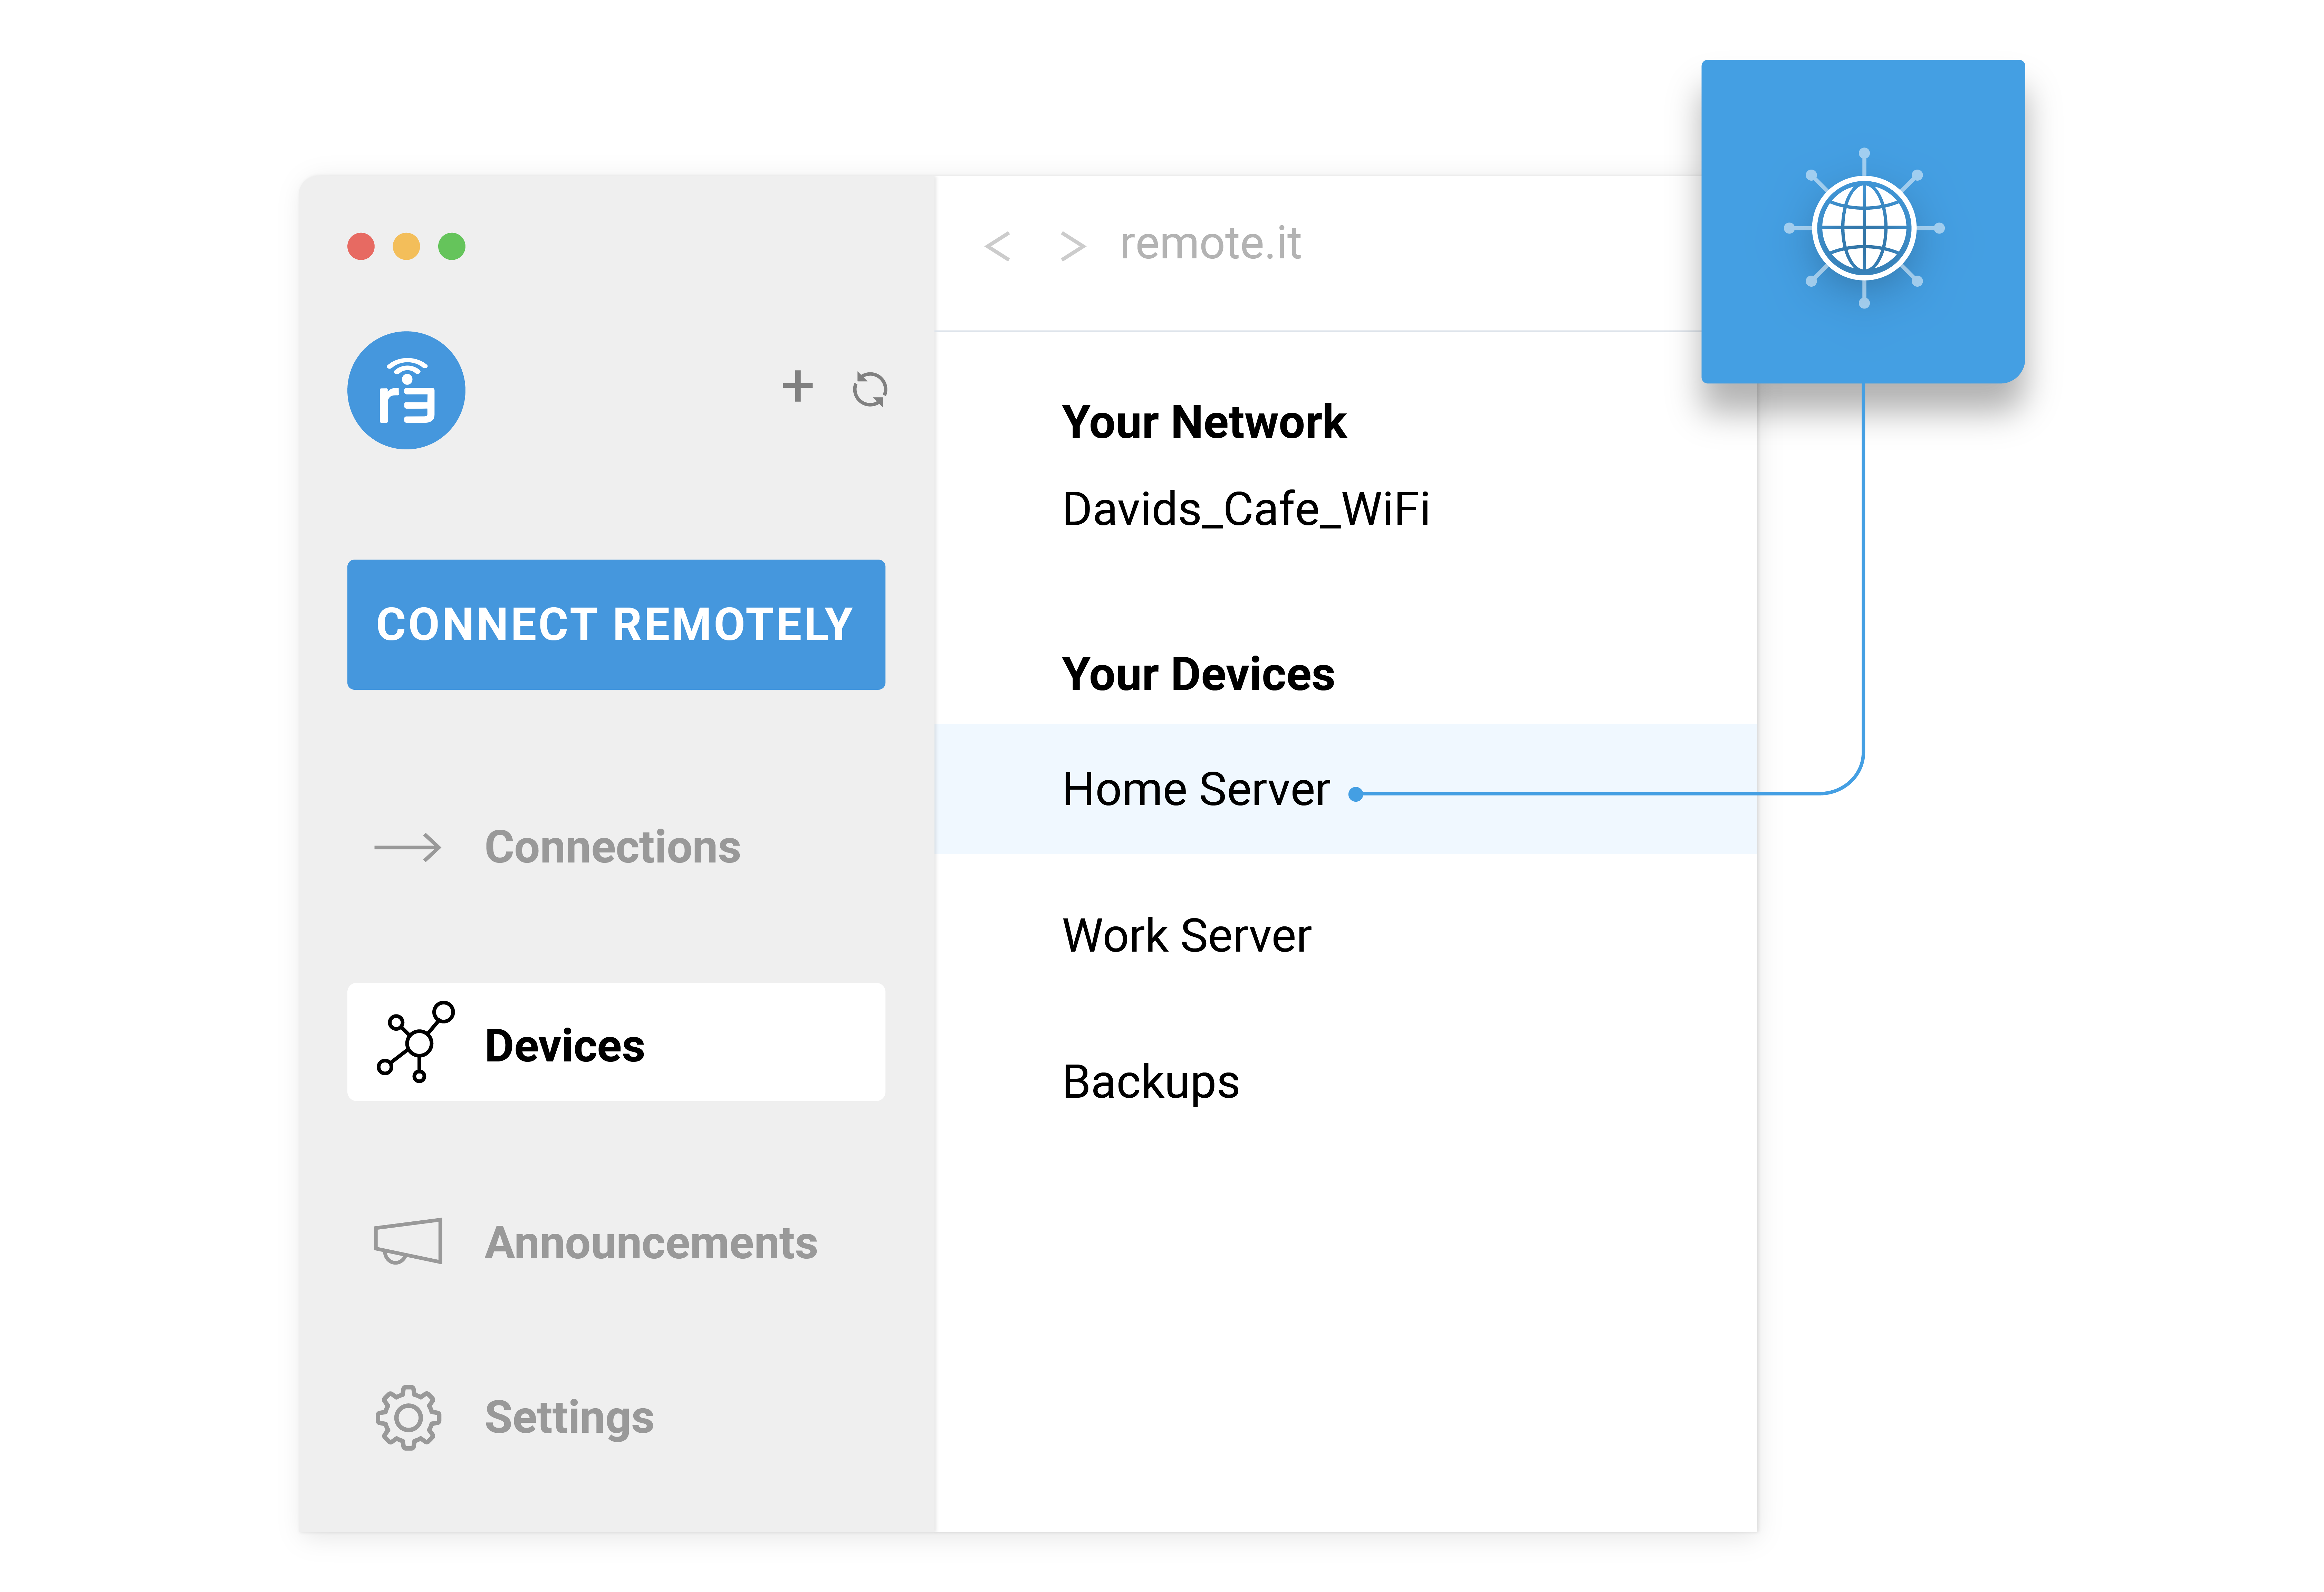 RMIT-Landing-Pages-Screenshots_VPN (2)